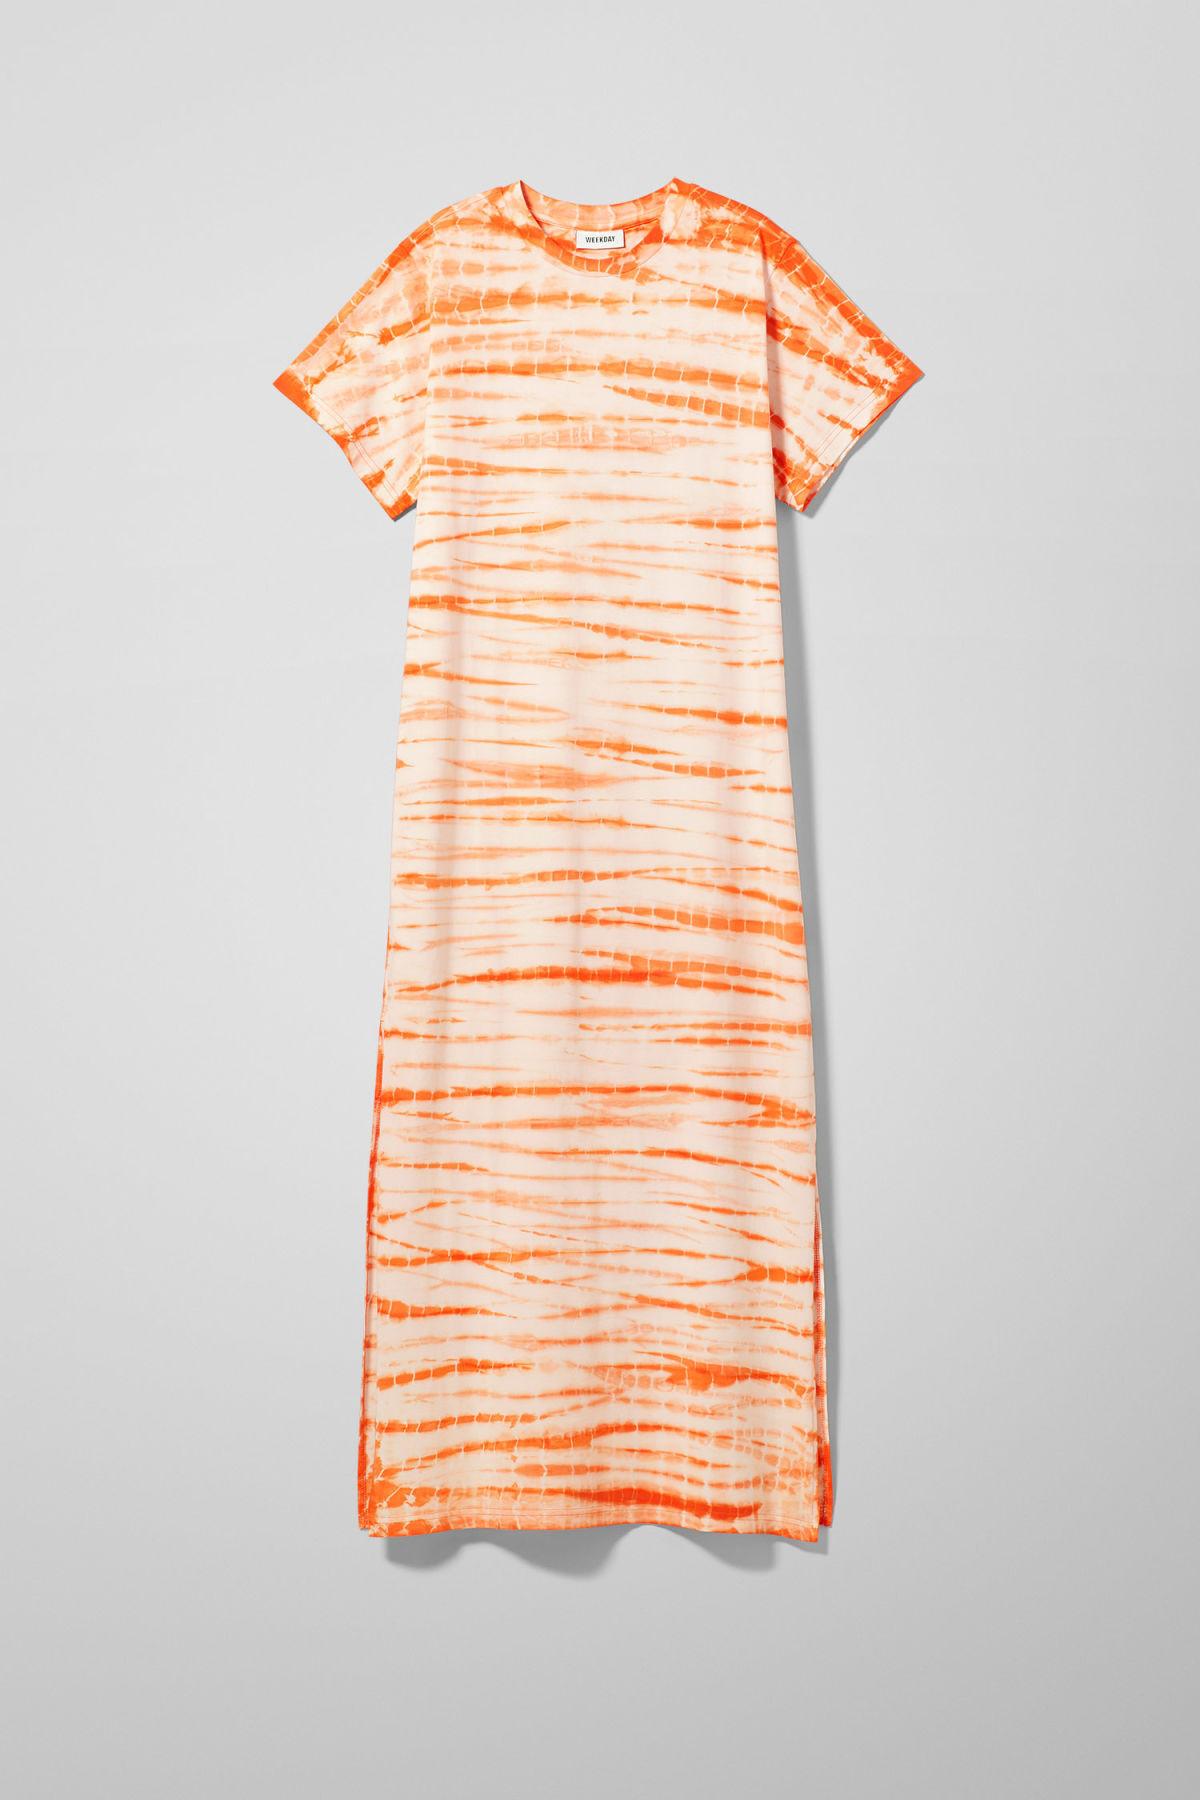 Image of Stroke Dress - Orange-XS